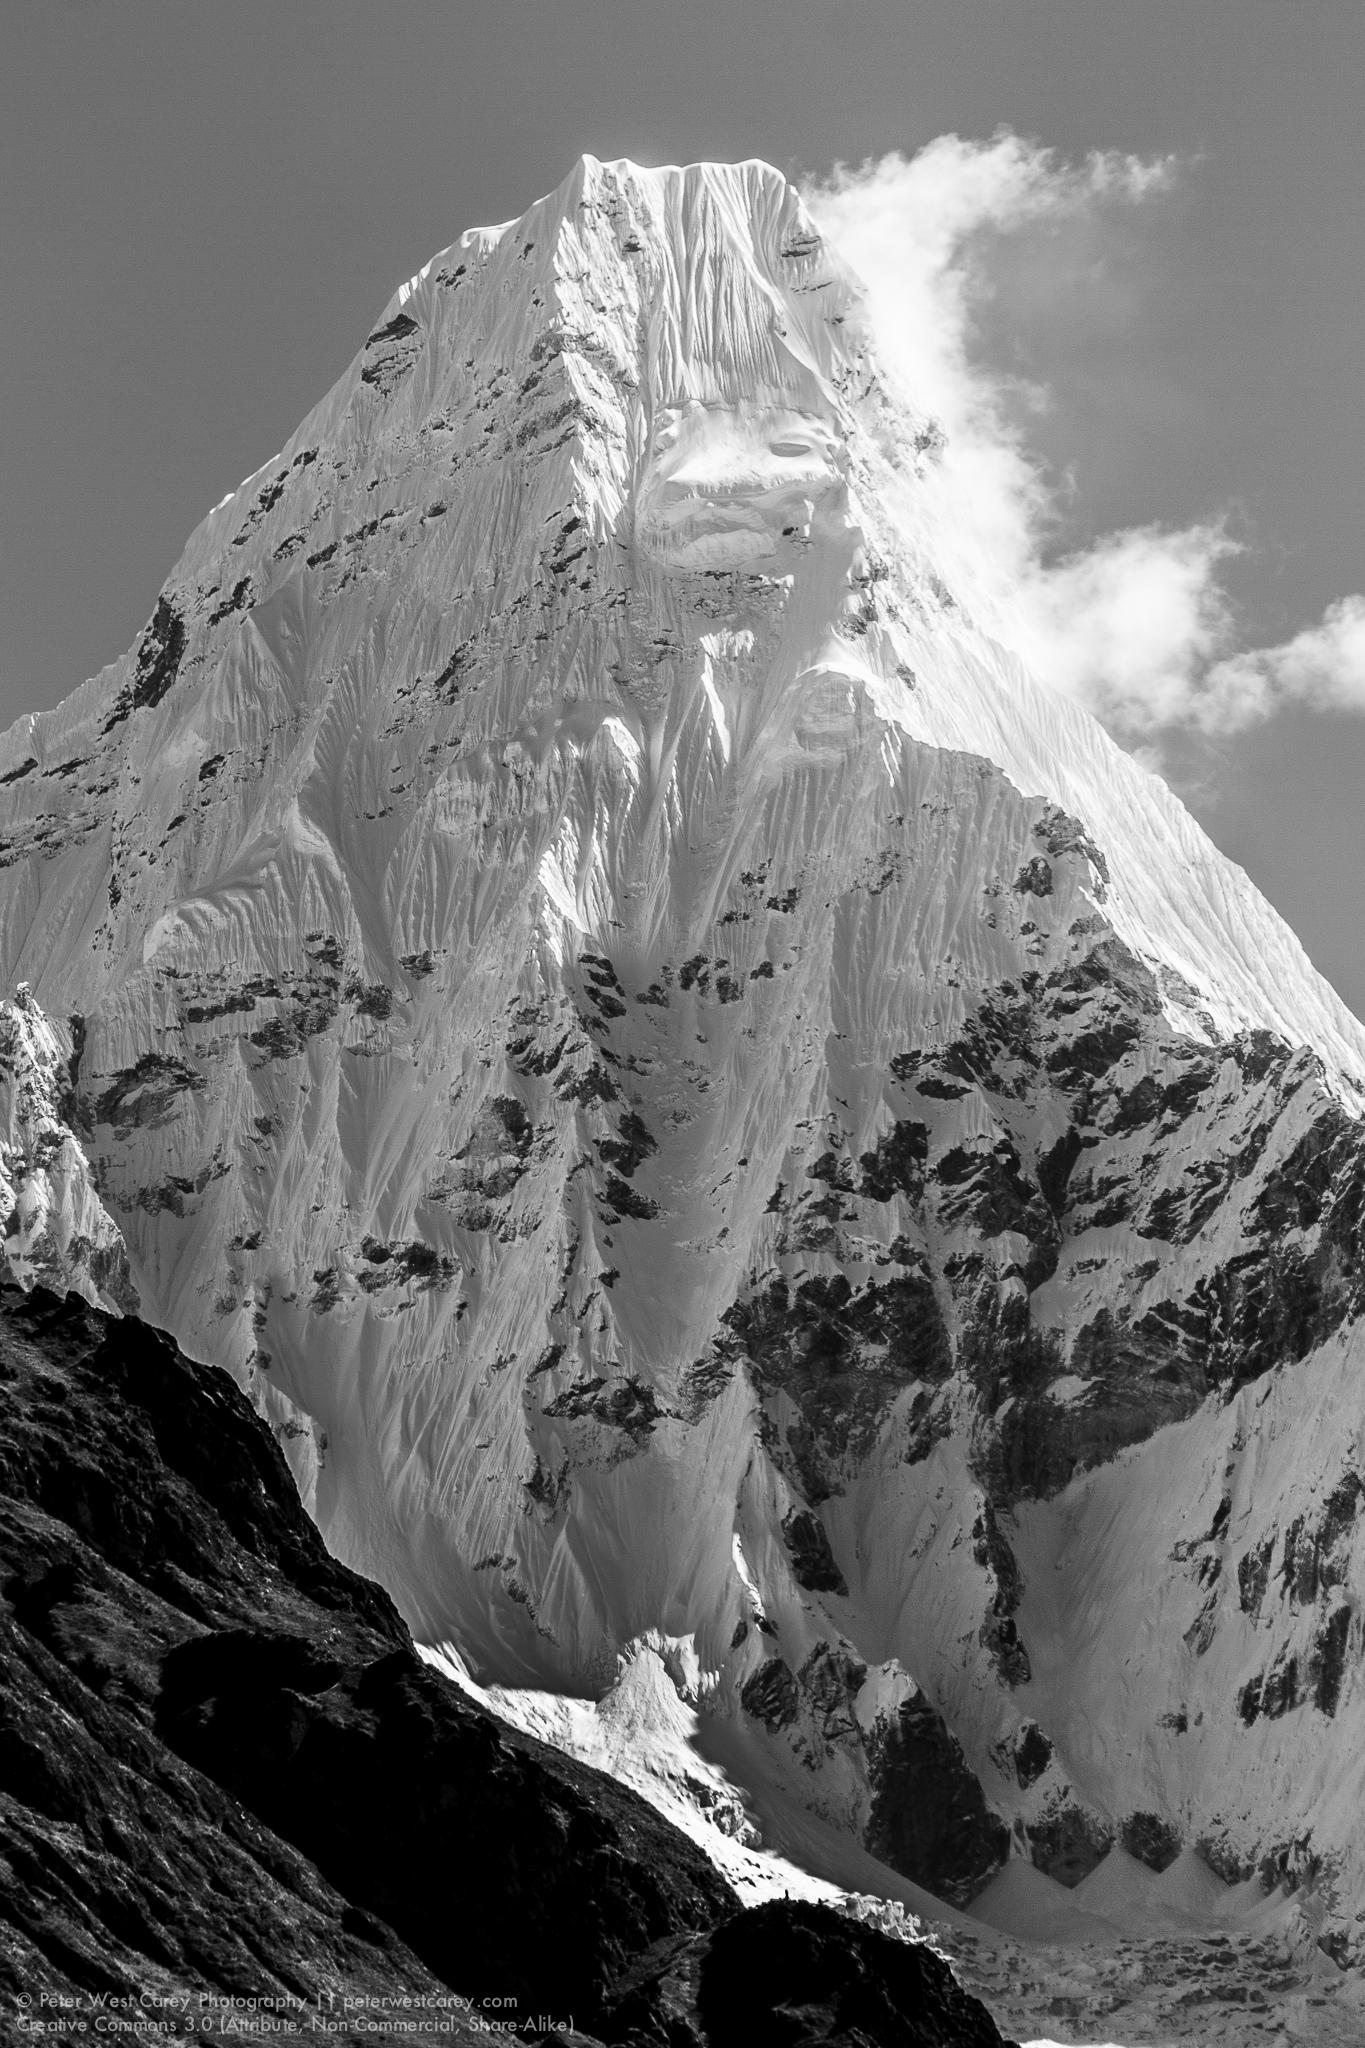 Ama Dablam, Solukhumbu, Nepal, Asia